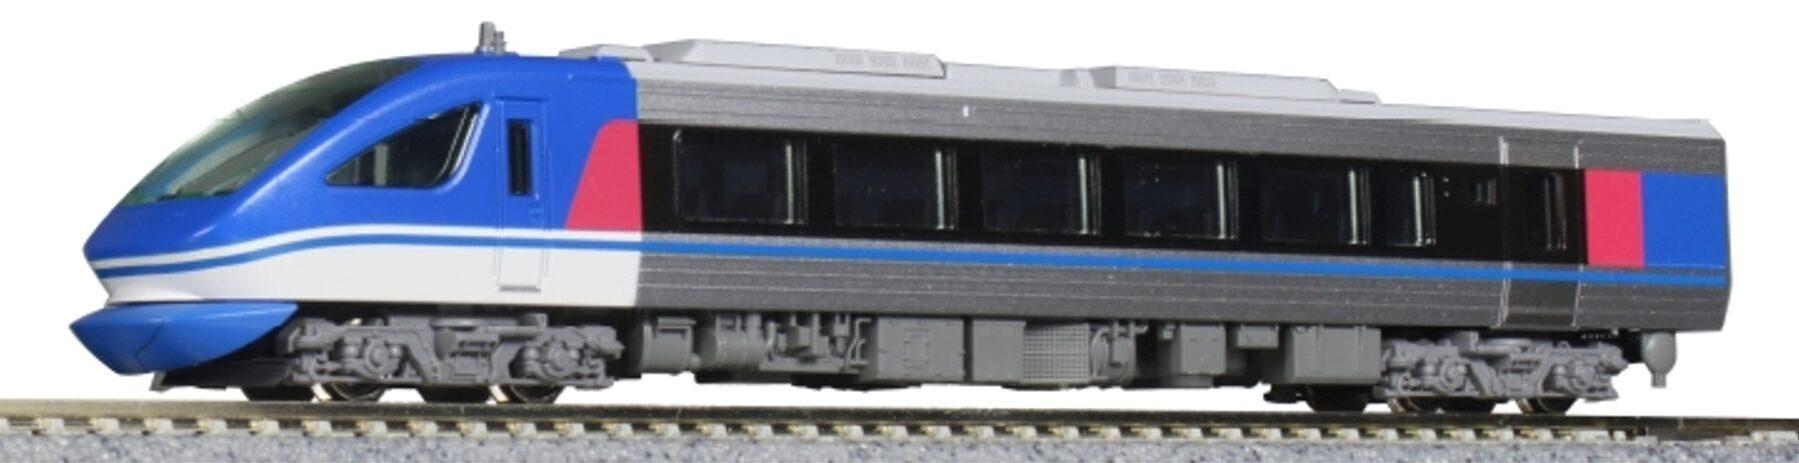 【KATO】京都駅店特製品 智頭急行 HOT7014